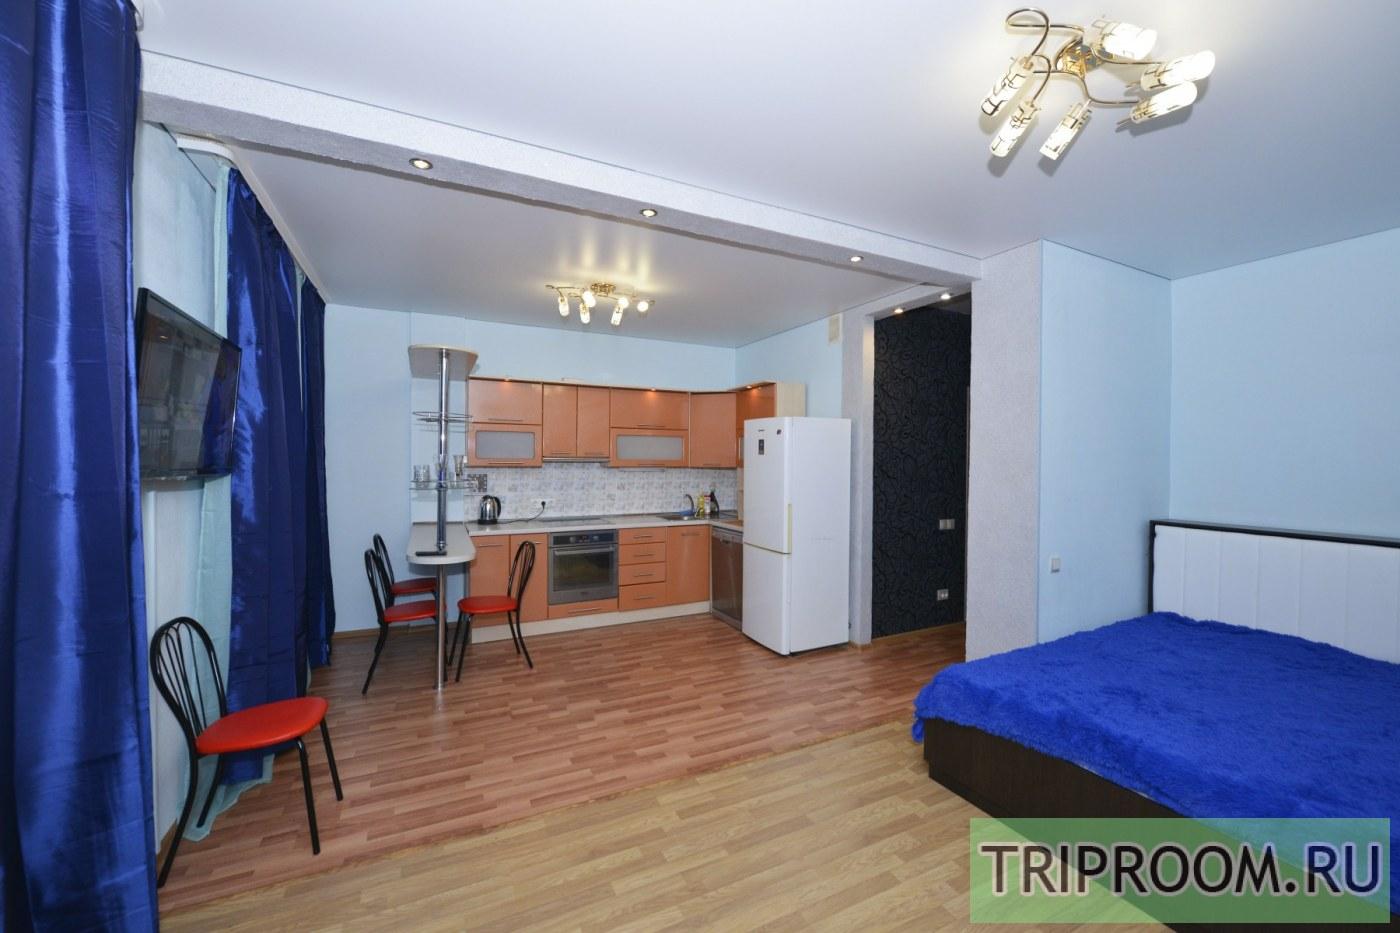 1-комнатная квартира посуточно (вариант № 40607), ул. Галущака улица, фото № 4